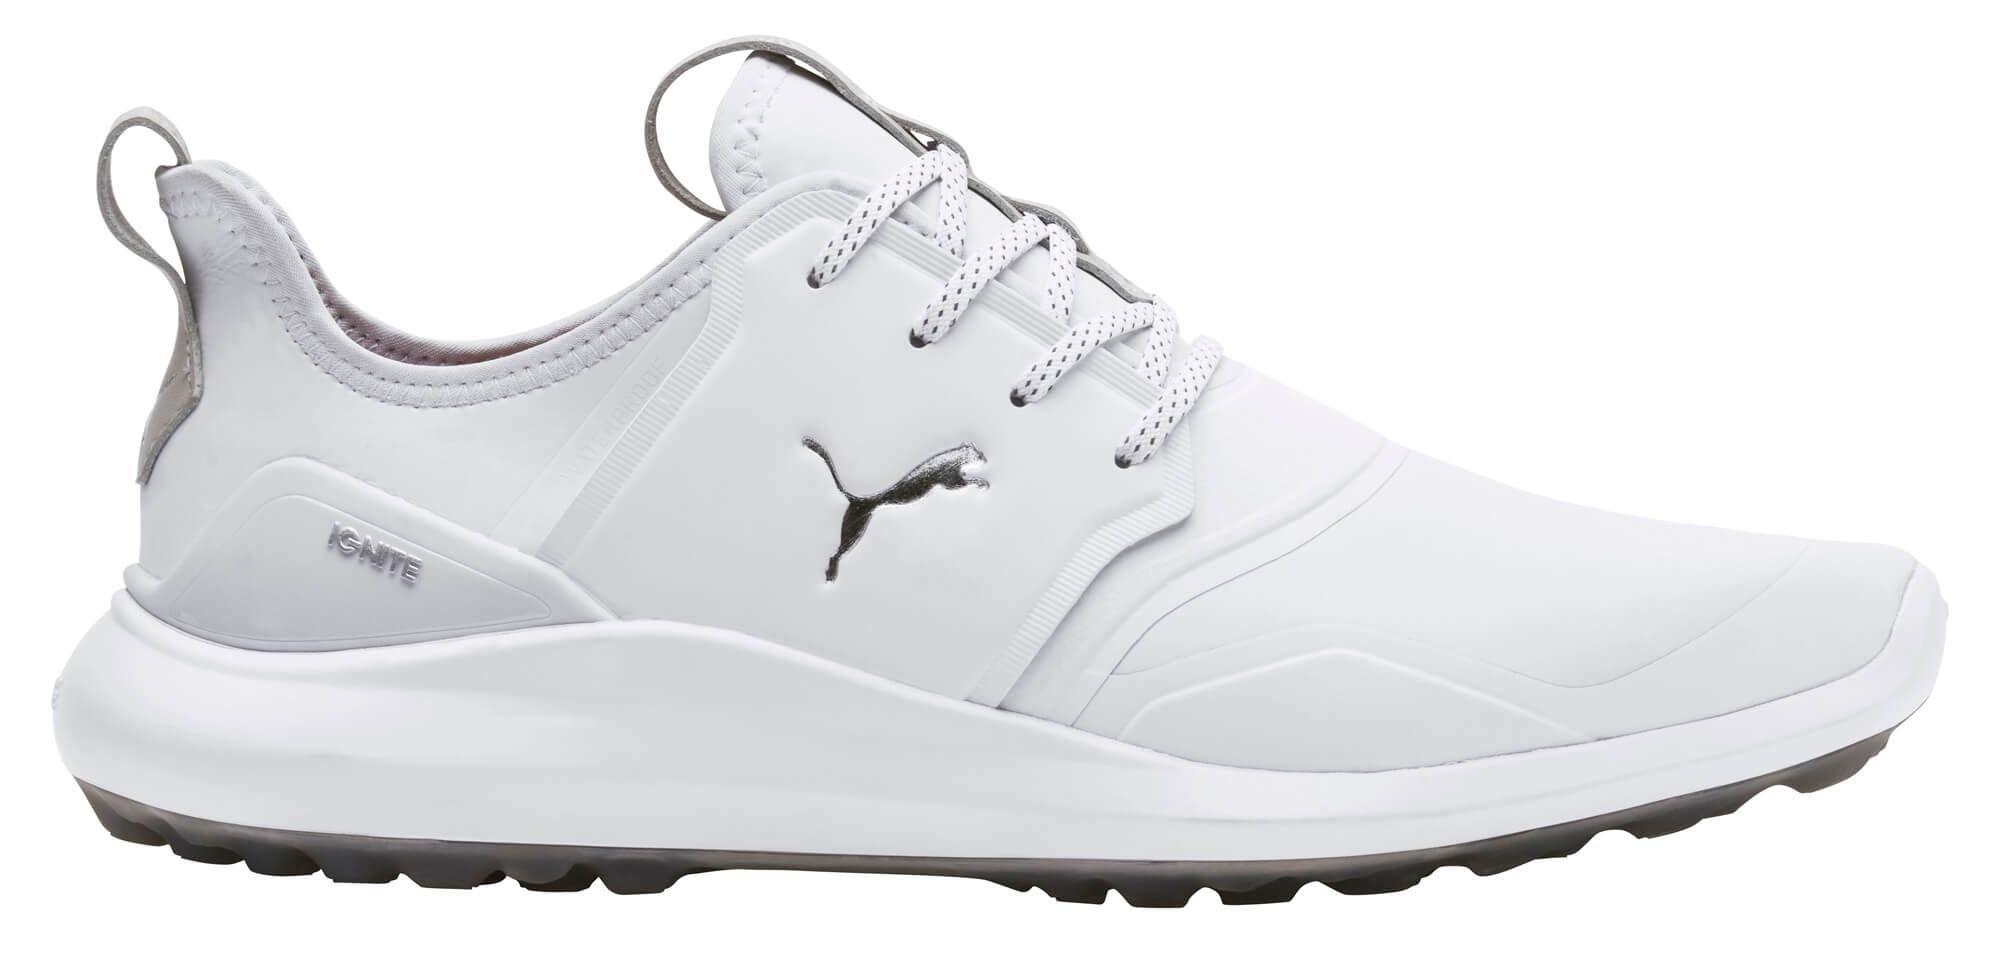 Puma Ignite NXT Pro Golf Shoes White